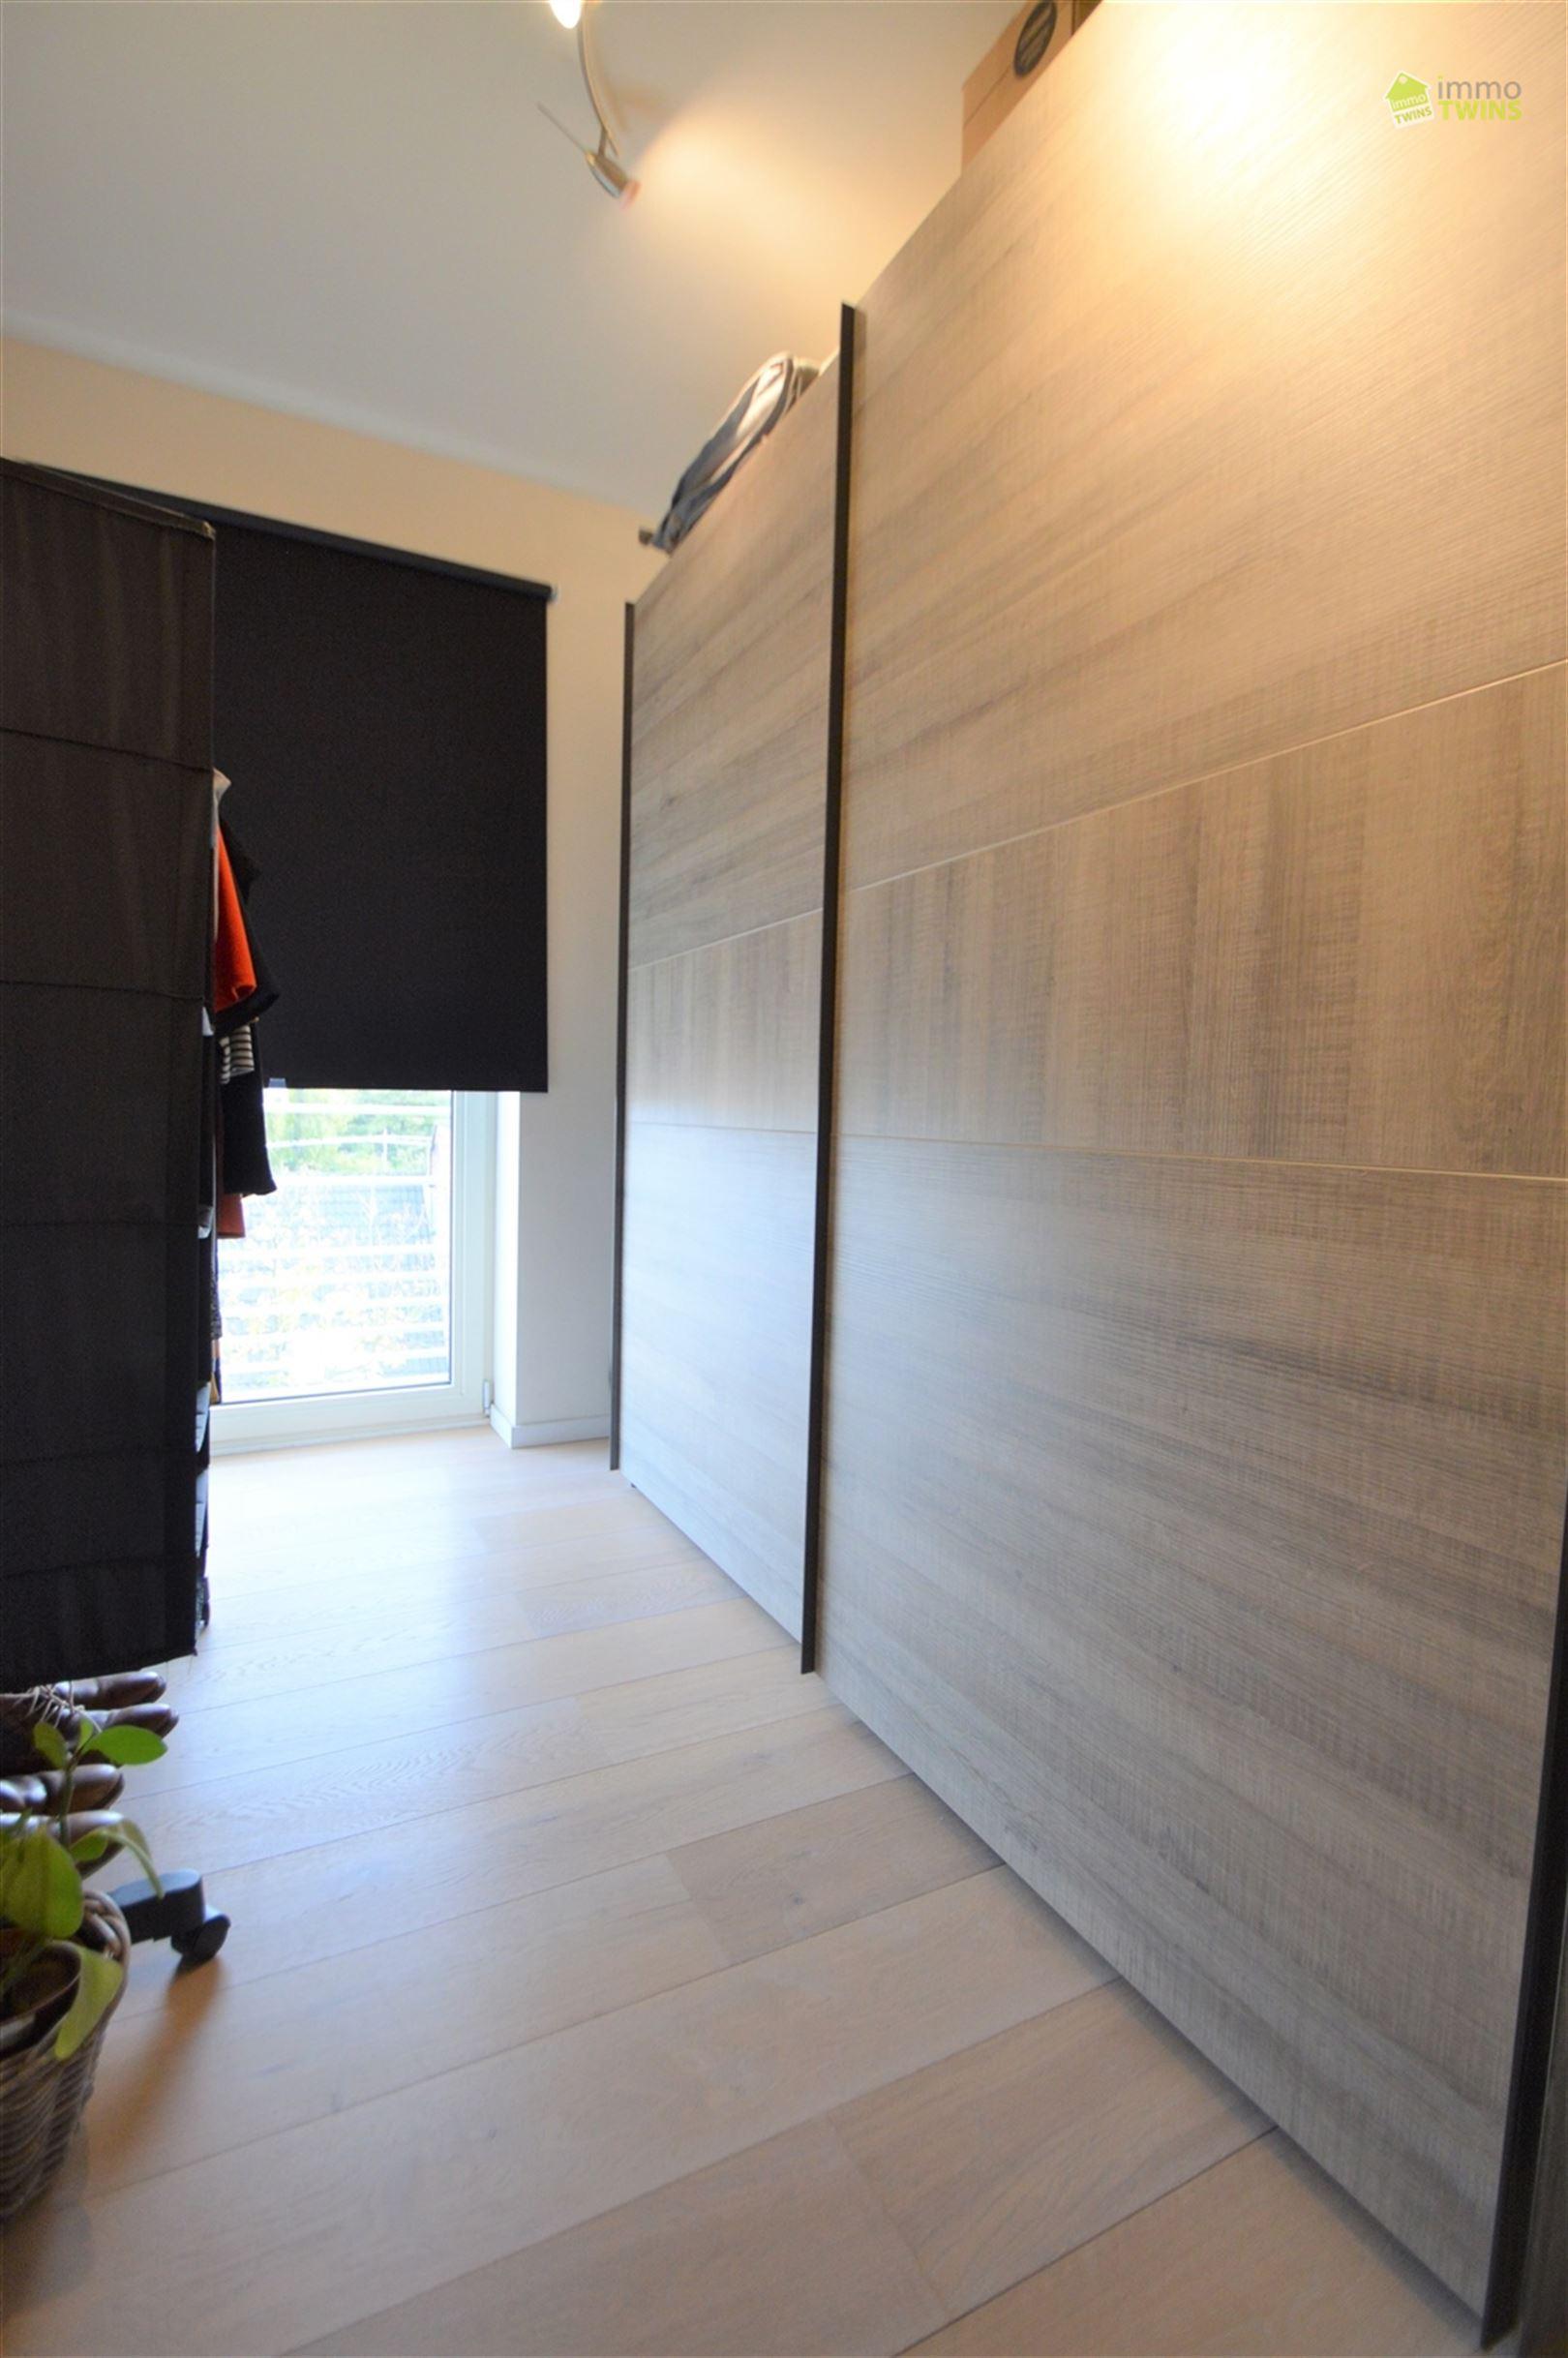 Foto 11 : Appartement te 9200 SINT-GILLIS-DENDERMONDE (België) - Prijs € 835